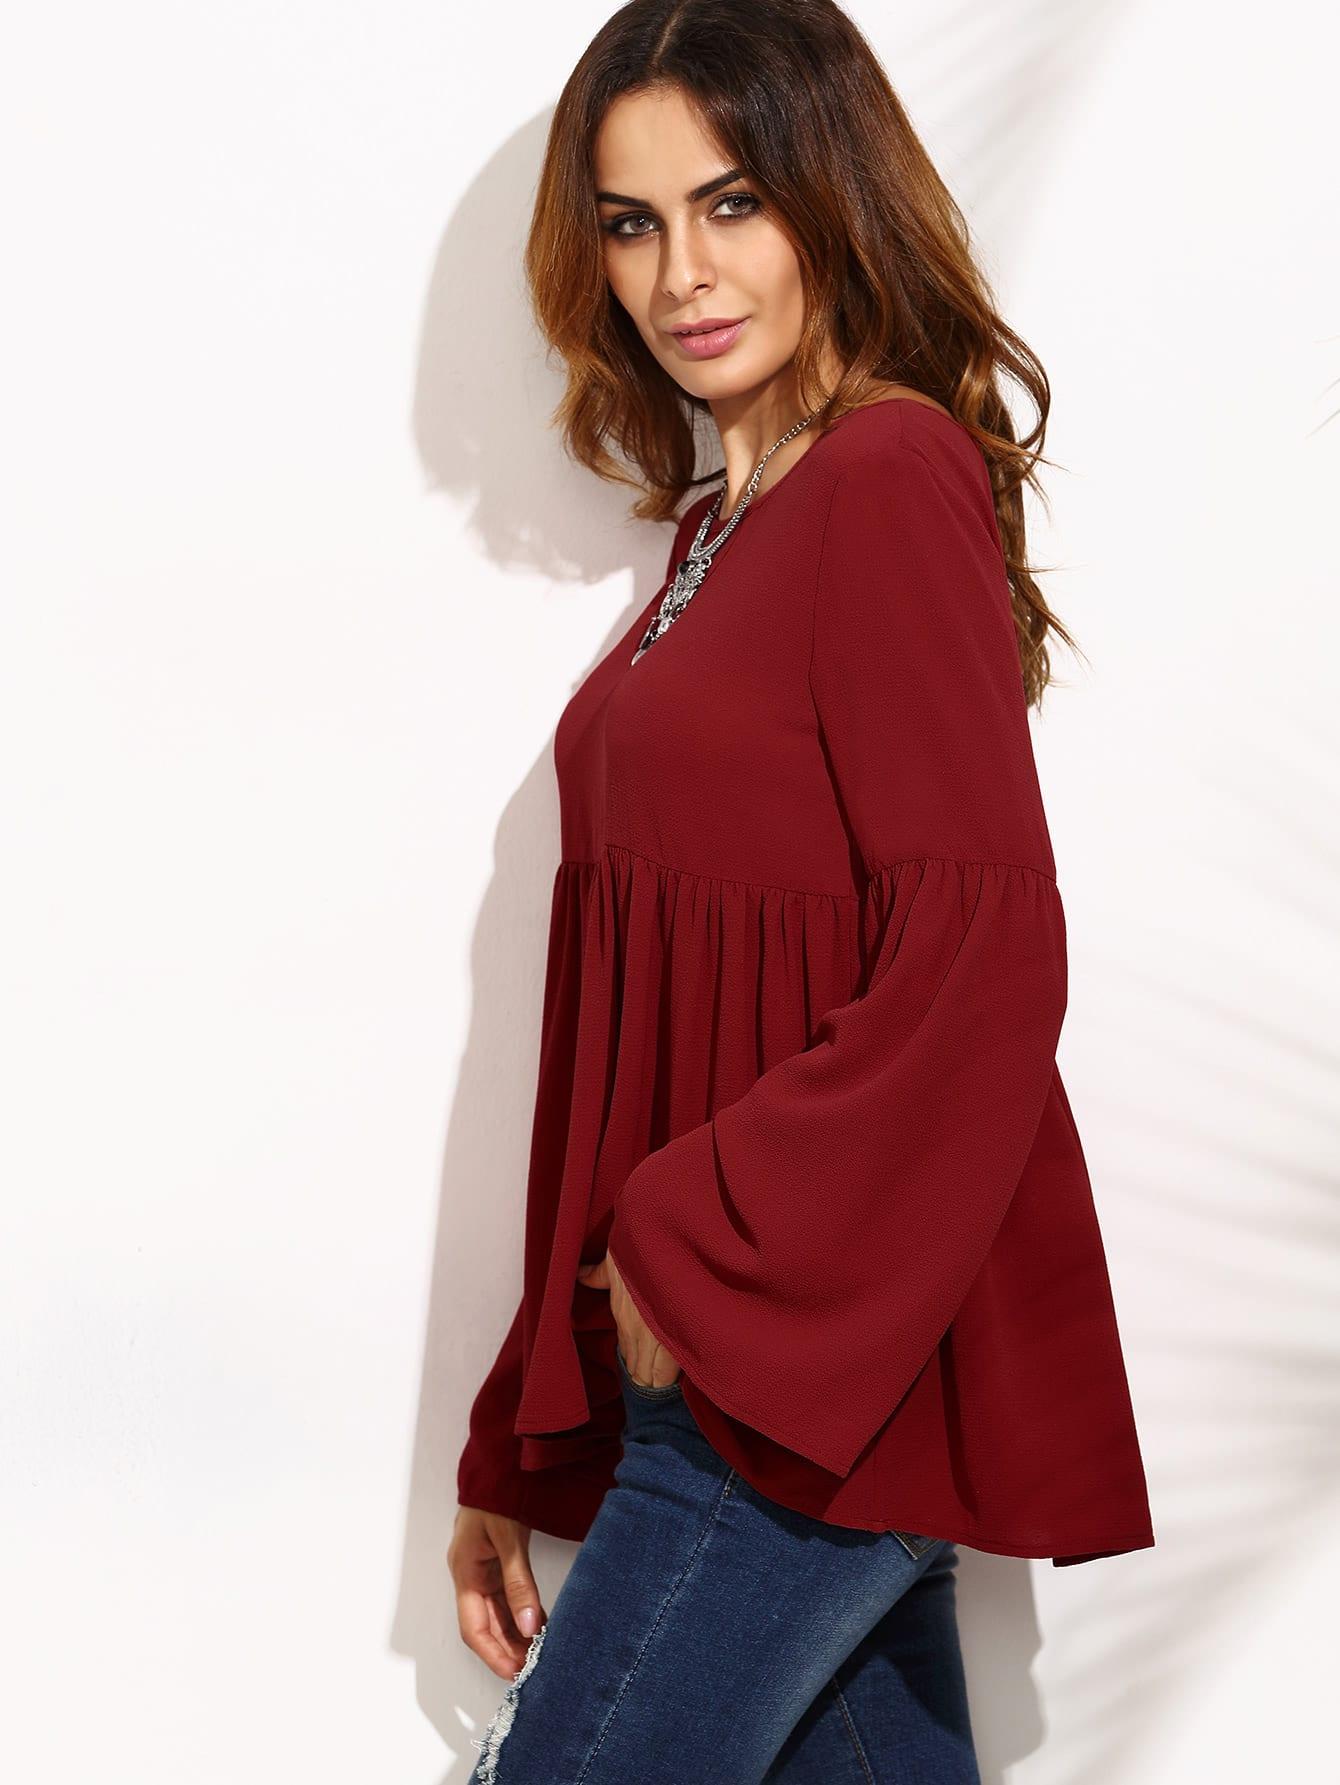 blouse160822501_2